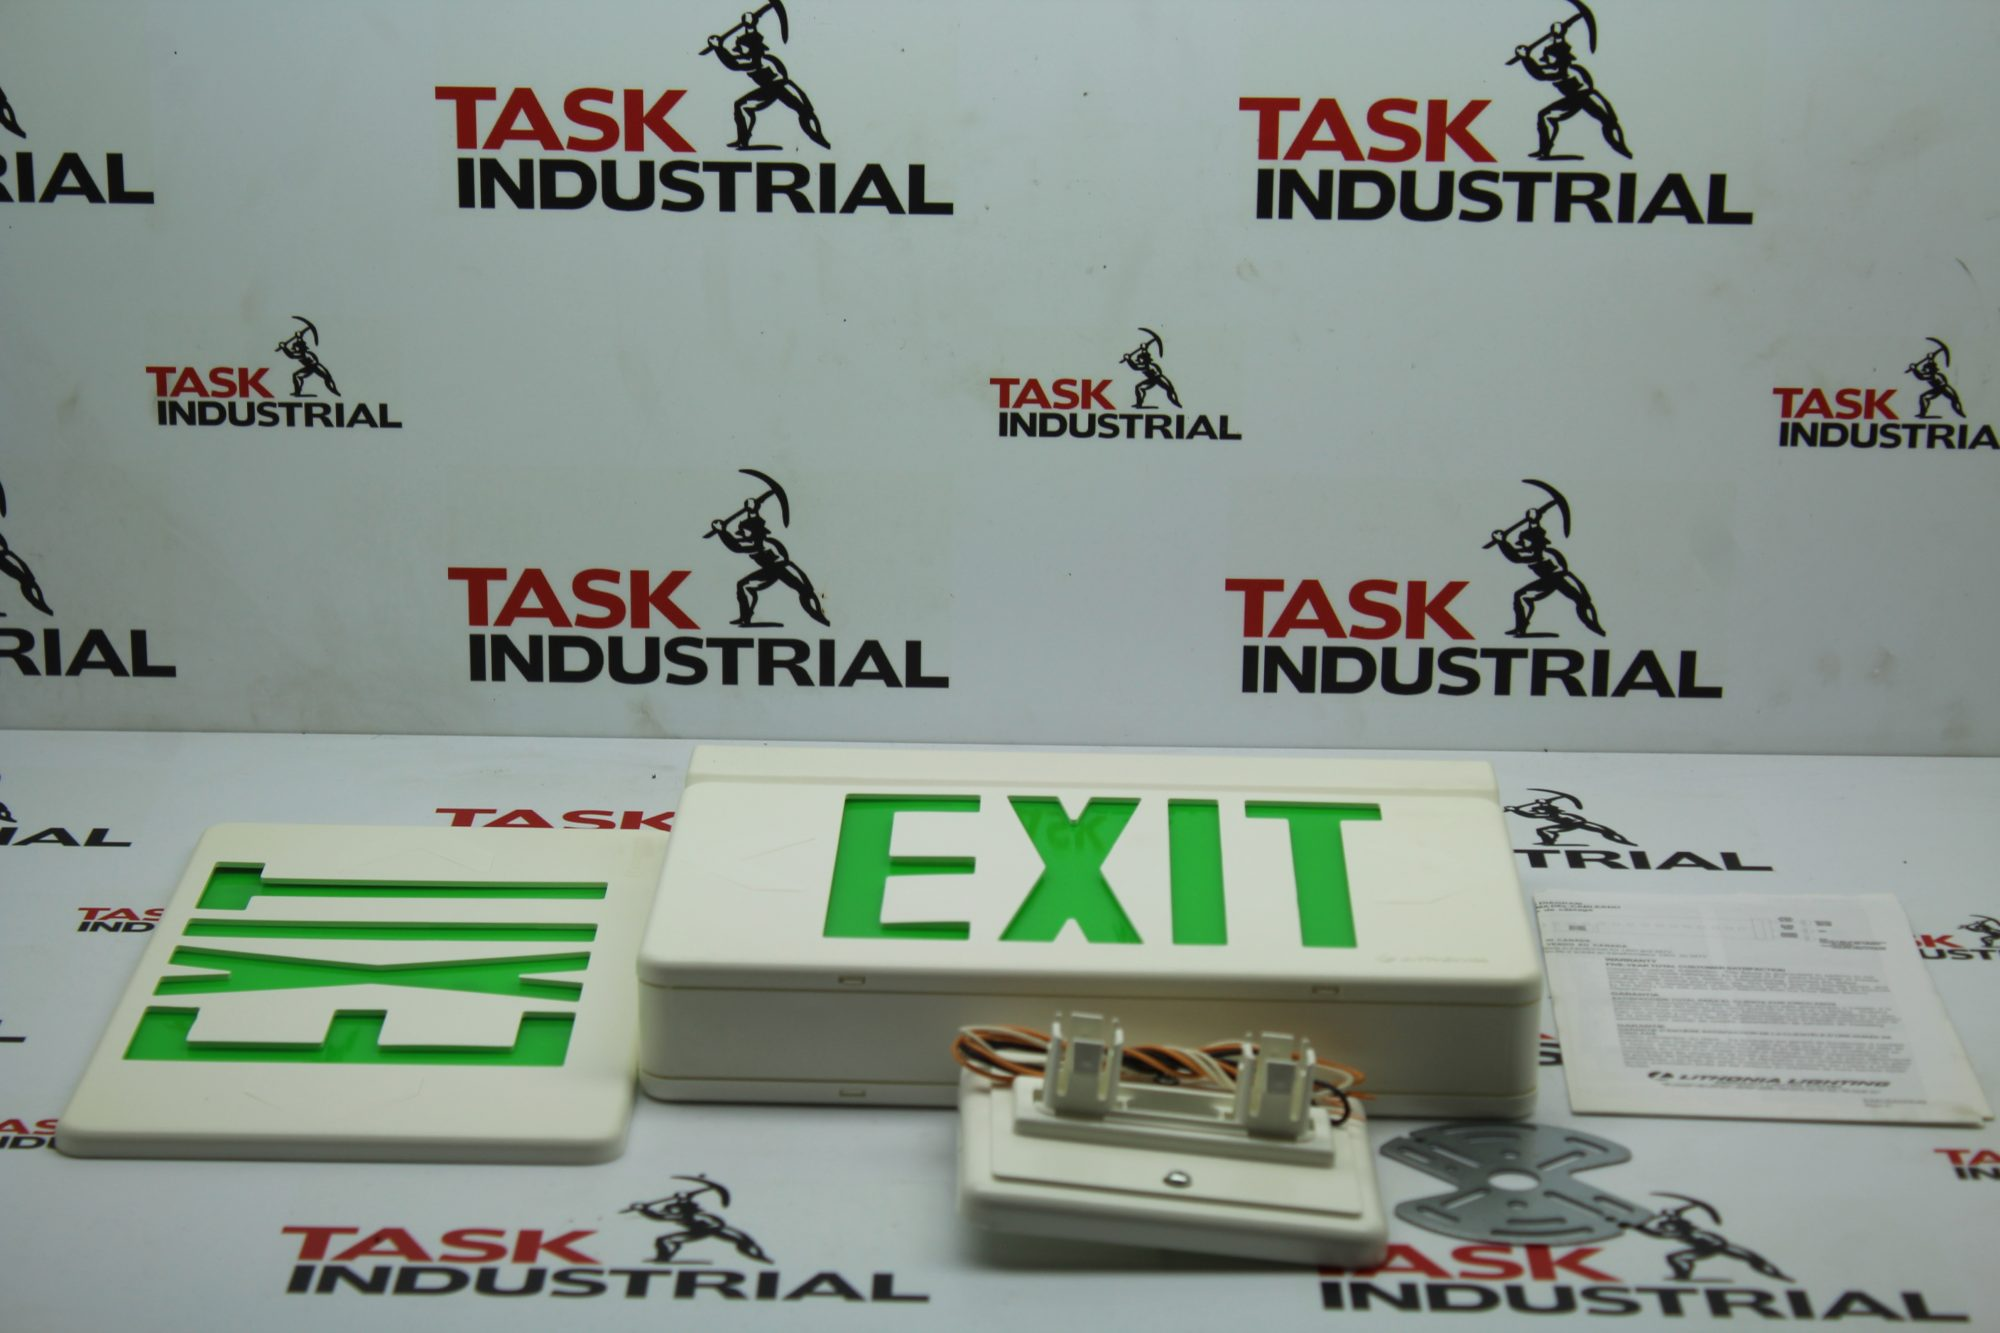 lithonia lighting lqm s w 3 g 120 277 el n sd polycarbonate emergency led exit sign